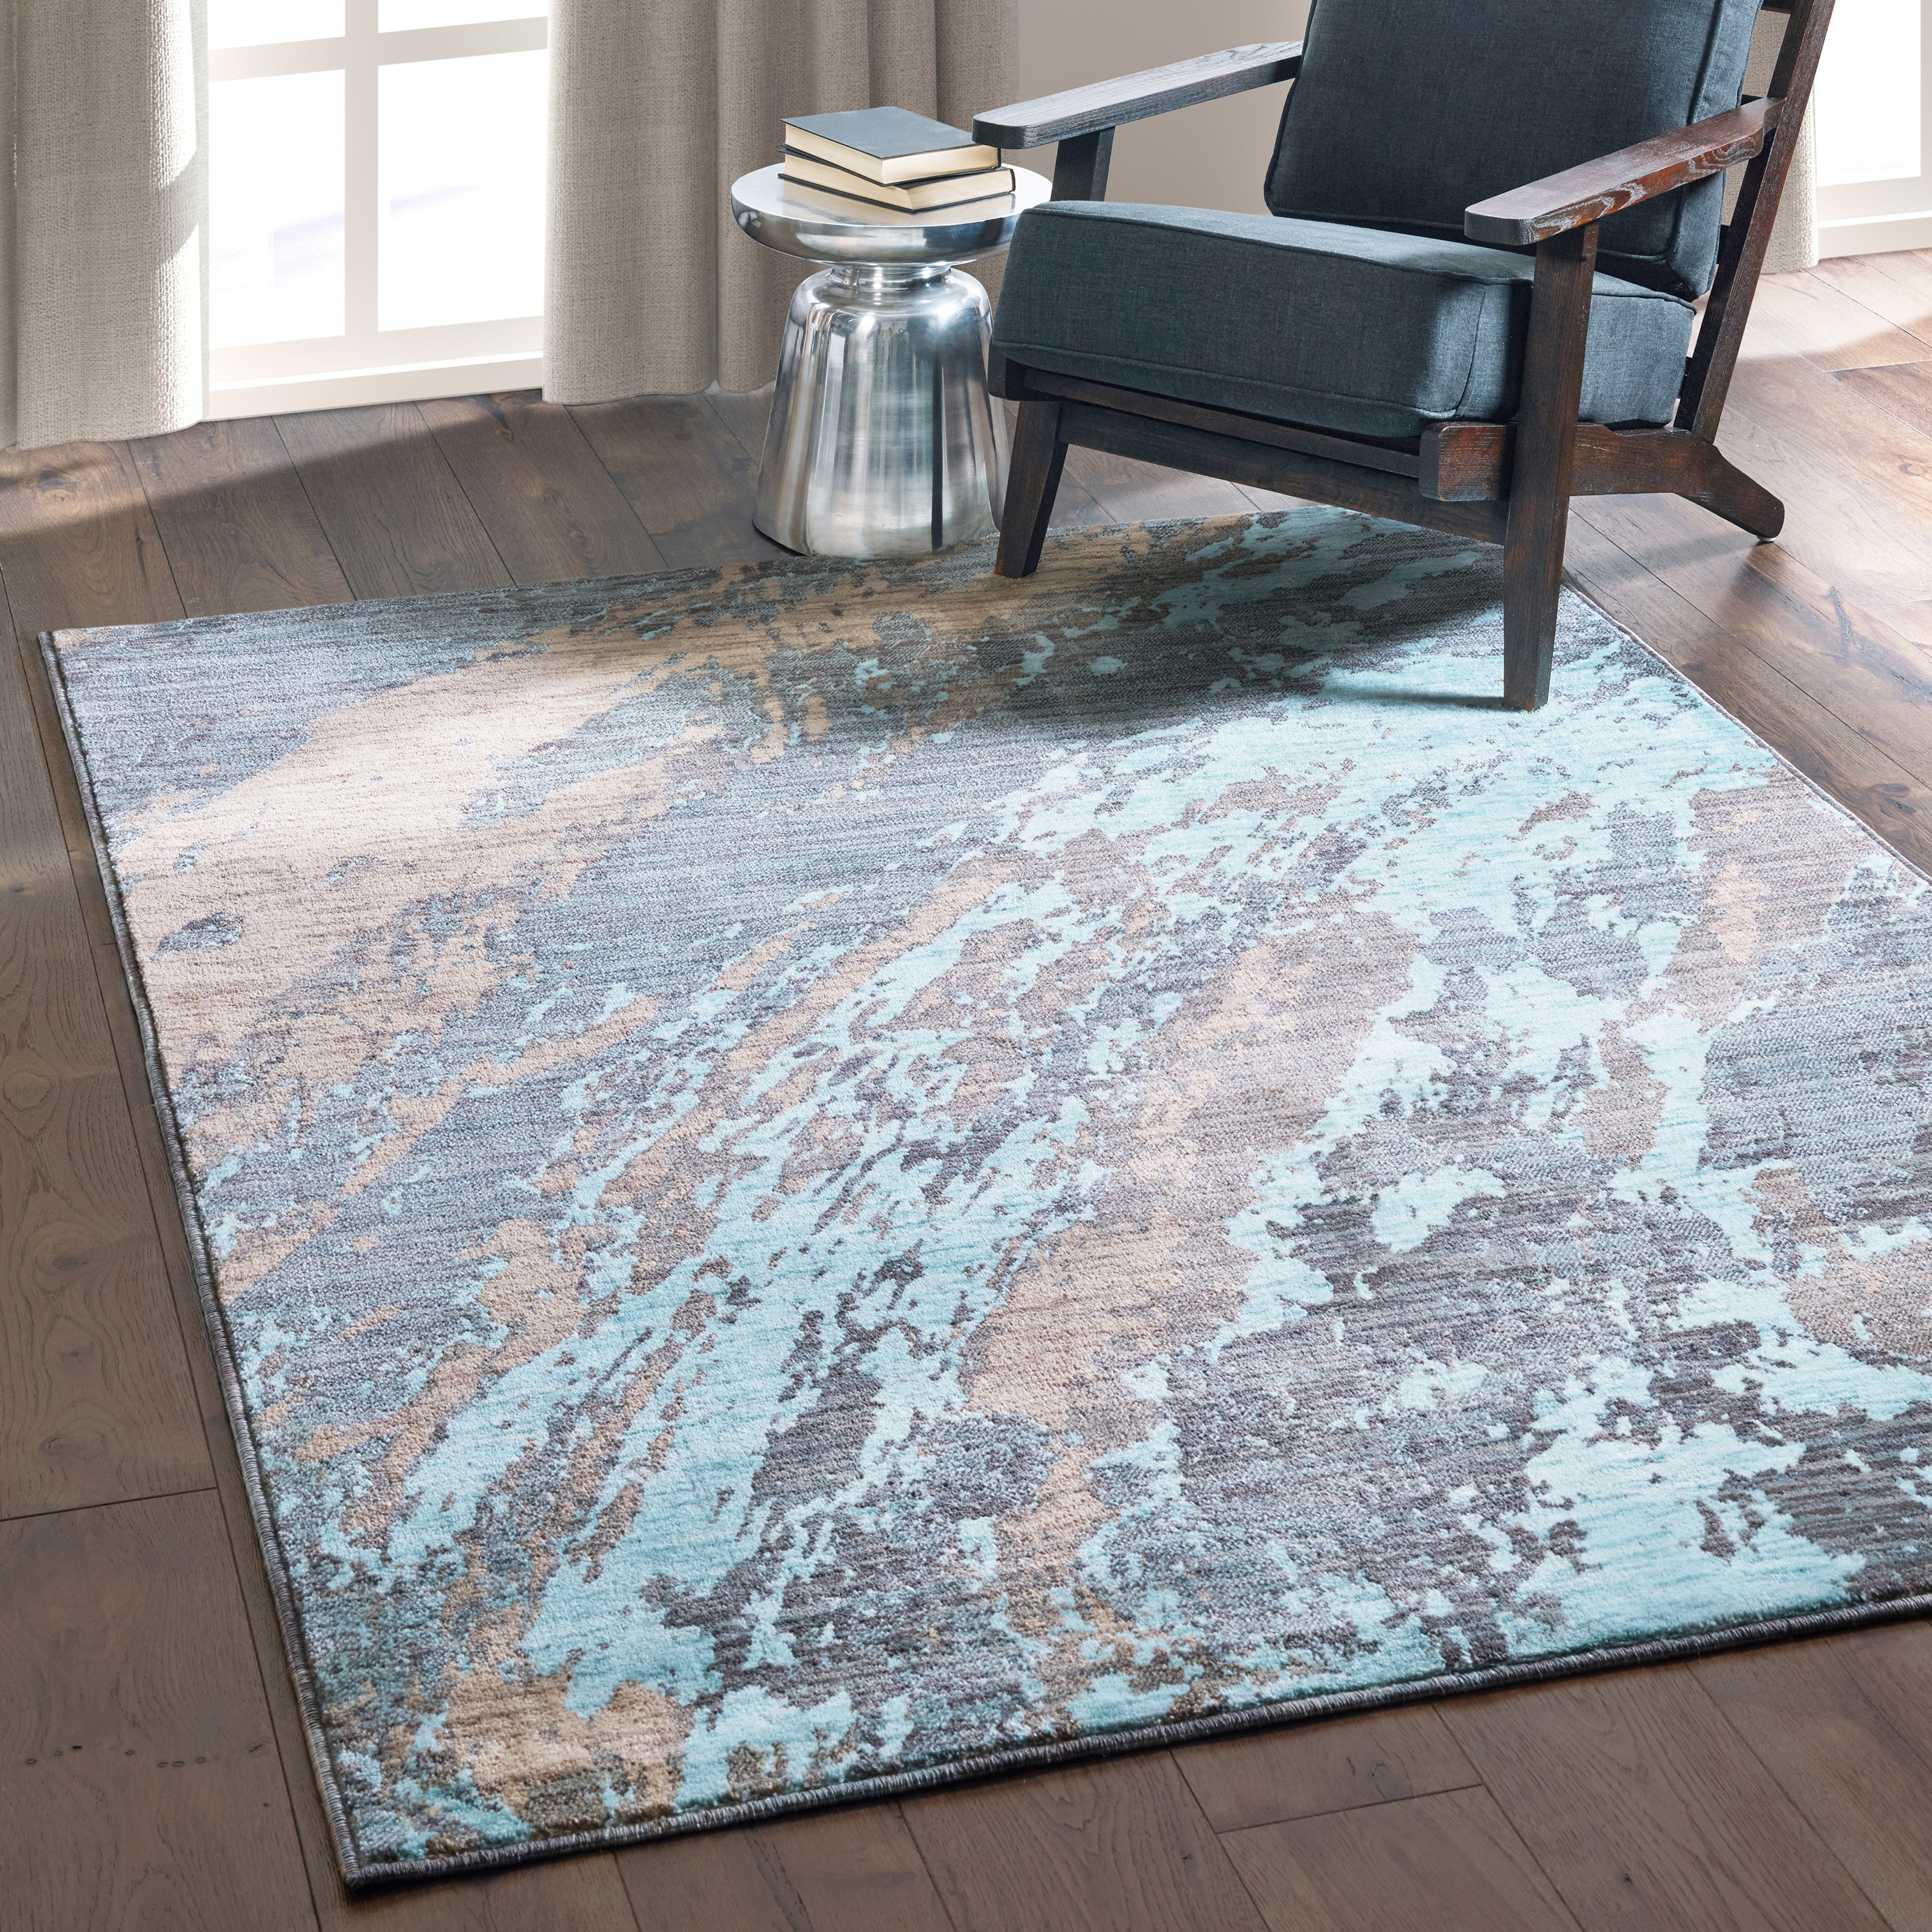 Carson Carrington Uddevalla Abstract Marble Blue/ Grey Rug - 67 x 96 (67 x 96 - Blue/Grey)